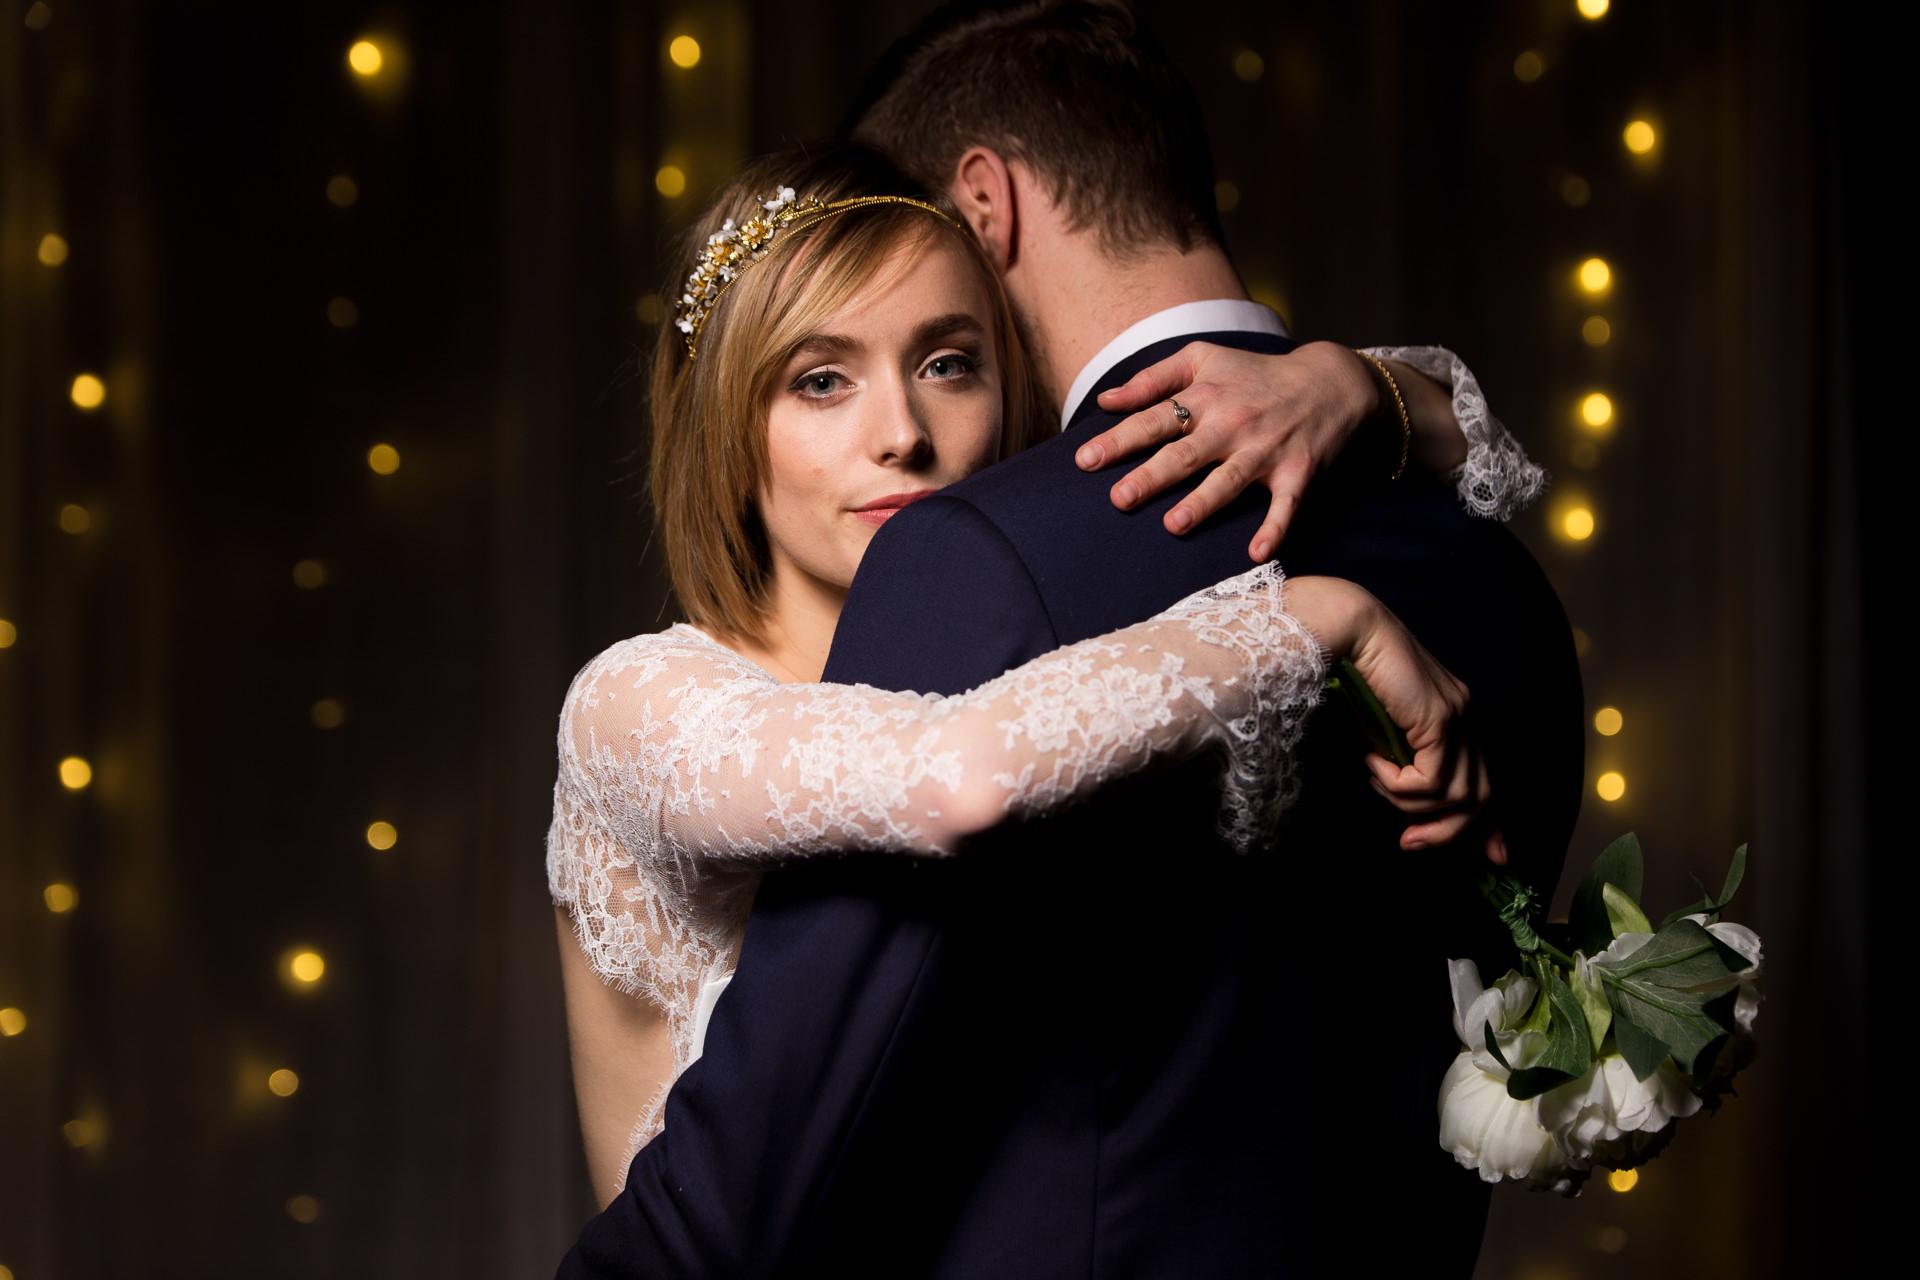 Splendide wedding photographe mariage val de marne romain et laura-1